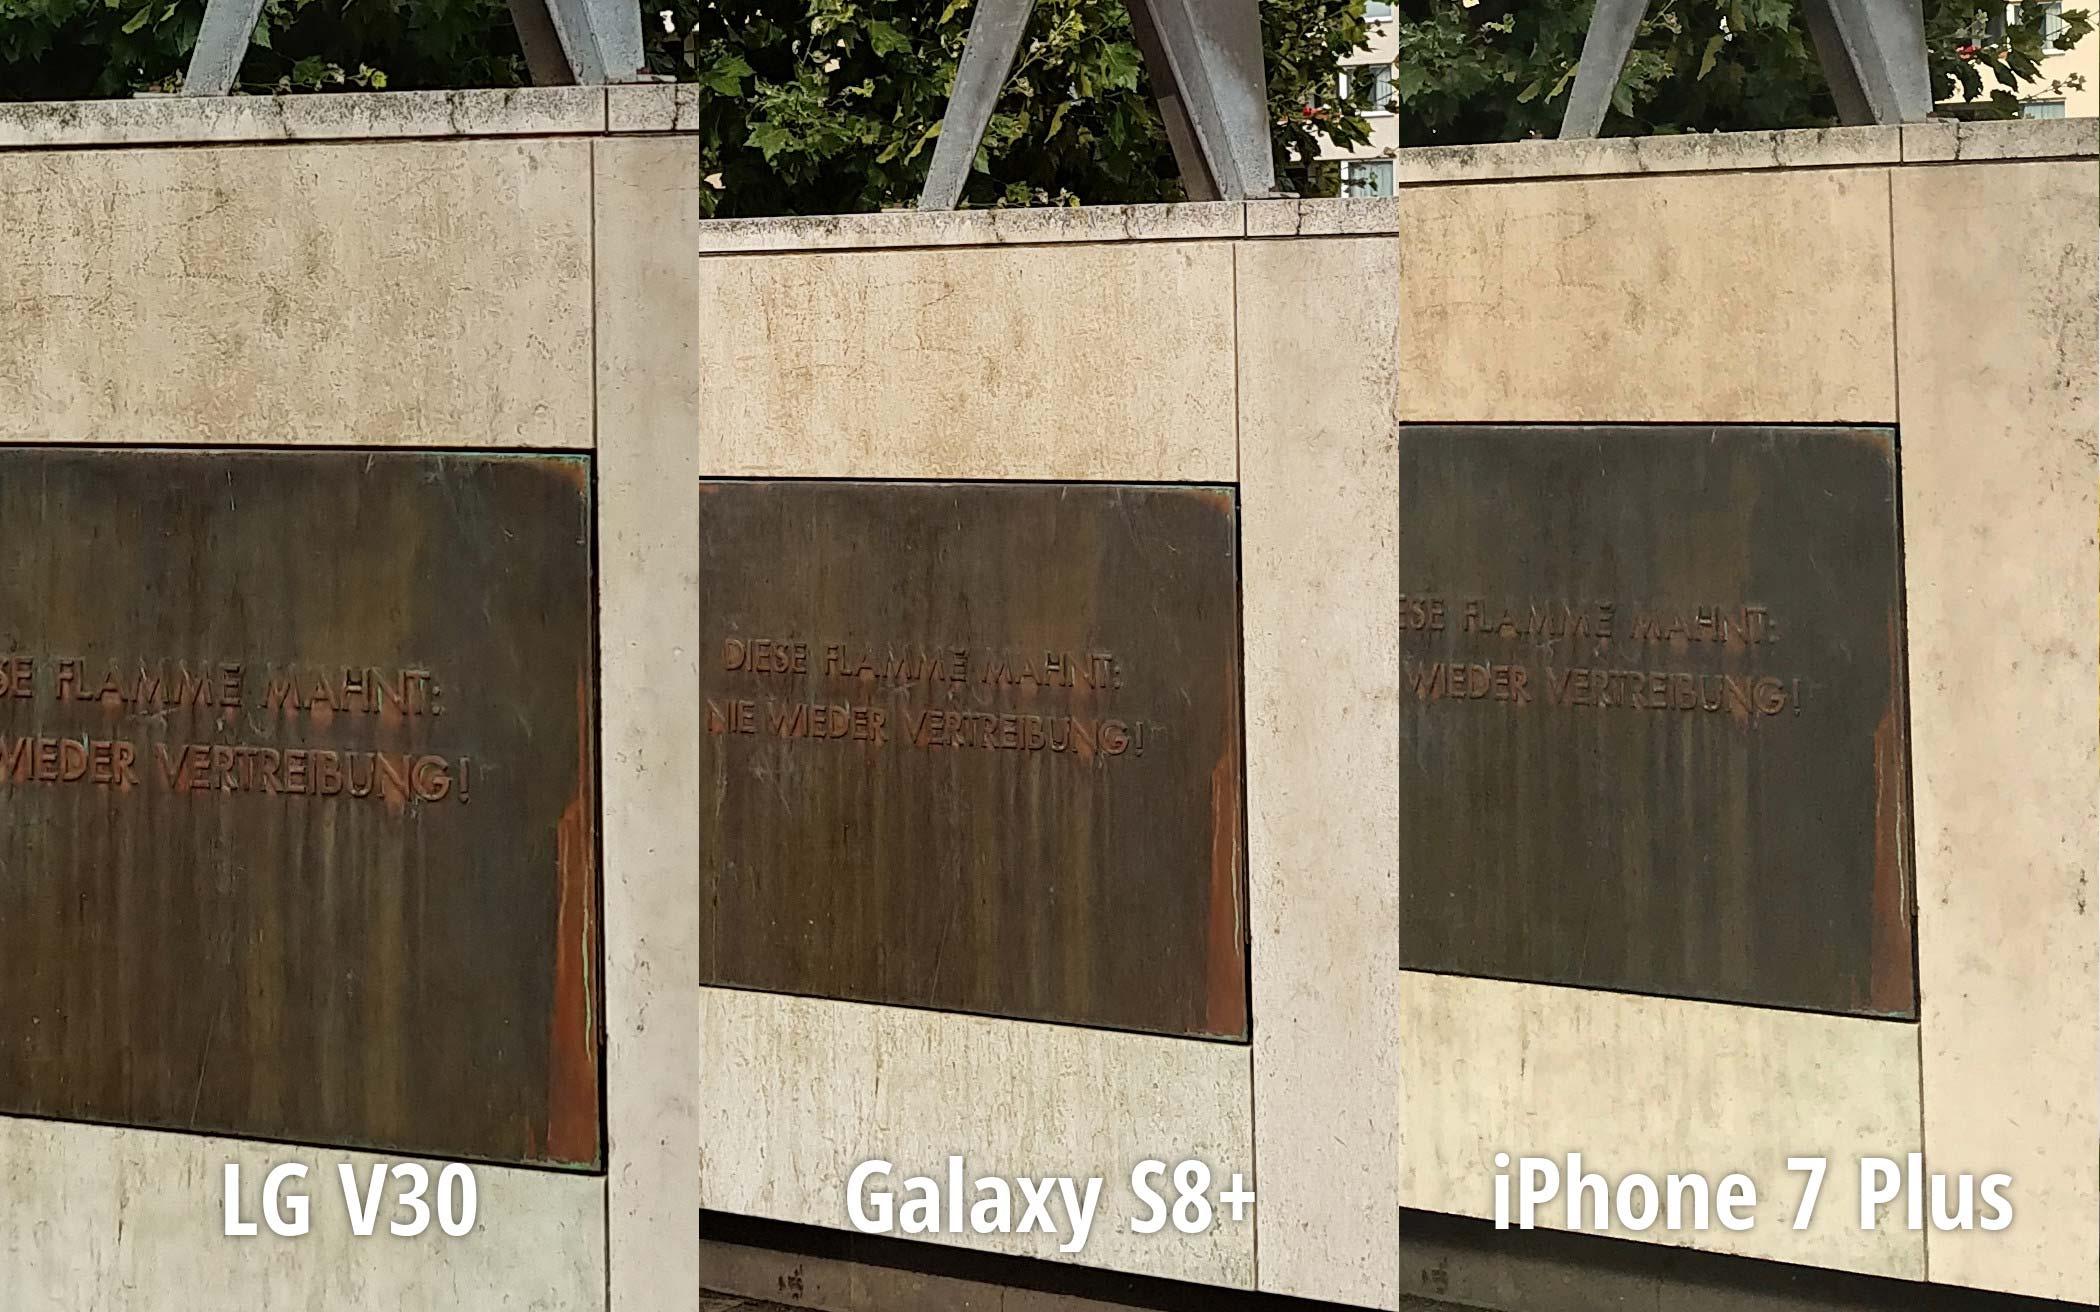 LG-V30-vs-Galaxy-S8-vs-iPhone-7-Plus-camera-photo-samples-(1).jpg